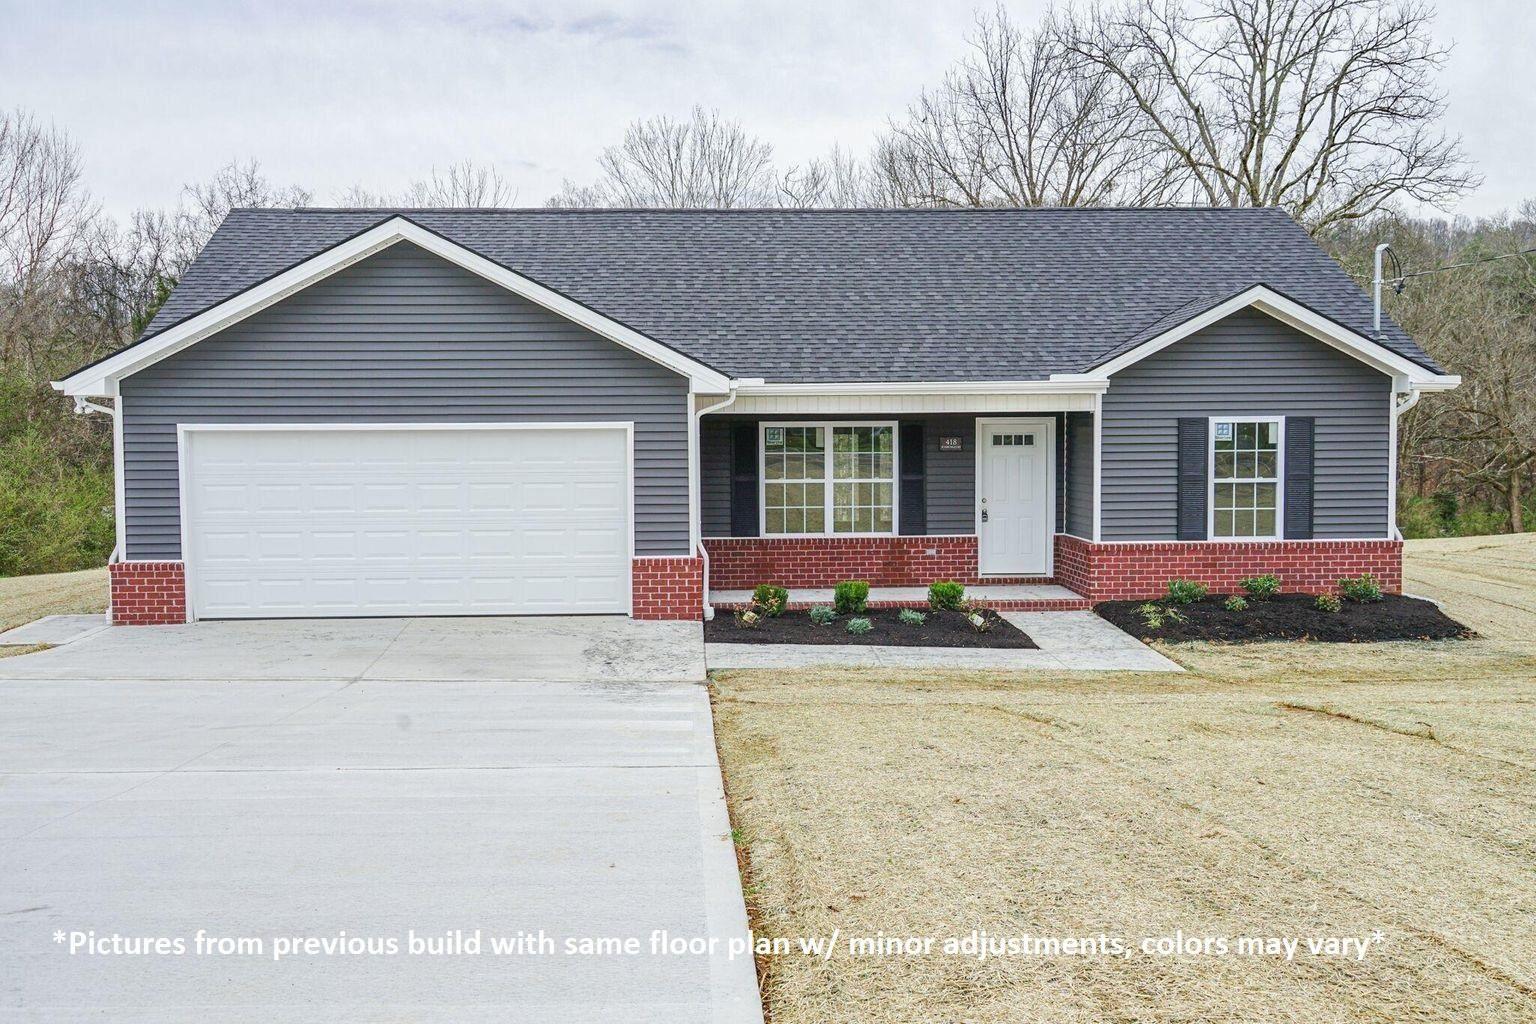 2231 Belt Rd Rd, Knoxville, TN 37920 - MLS#: 1157185